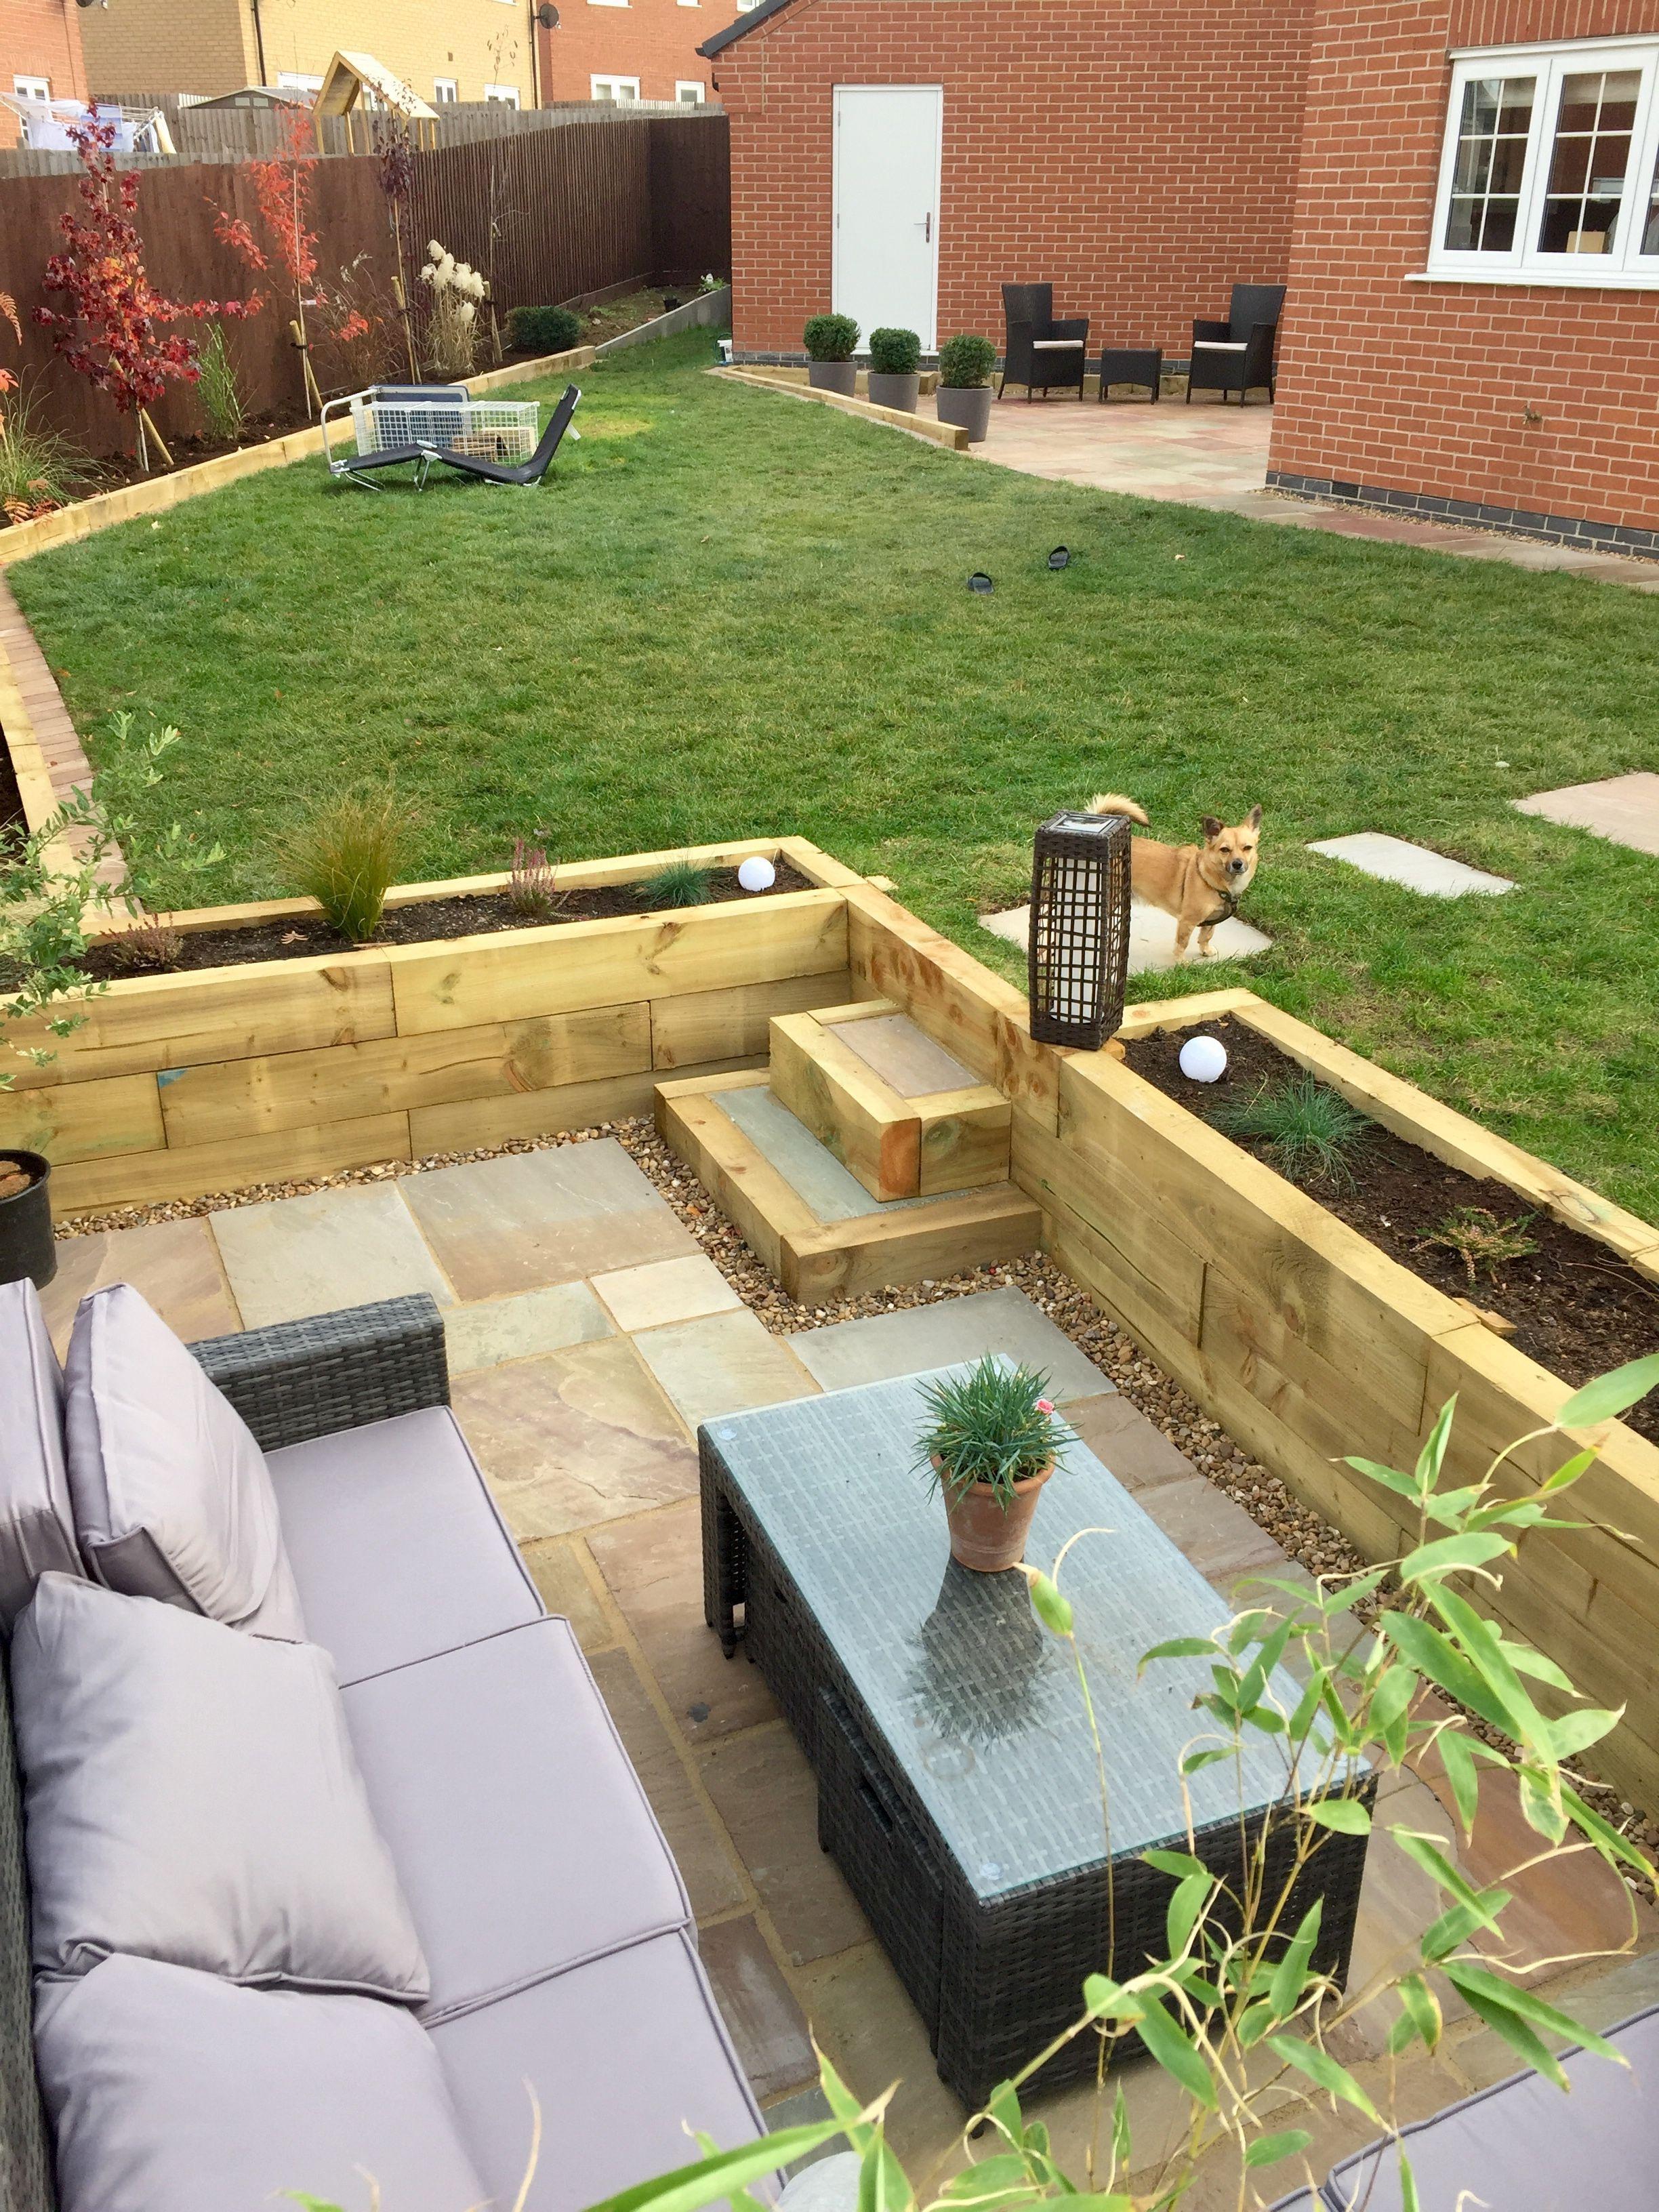 Awesome 25 Creative Sunken Sitting Areas For A Mesmerizing Backyard Landscape Https Coachdecor C Backyard Garden Landscape Backyard Fire Backyard Landscaping